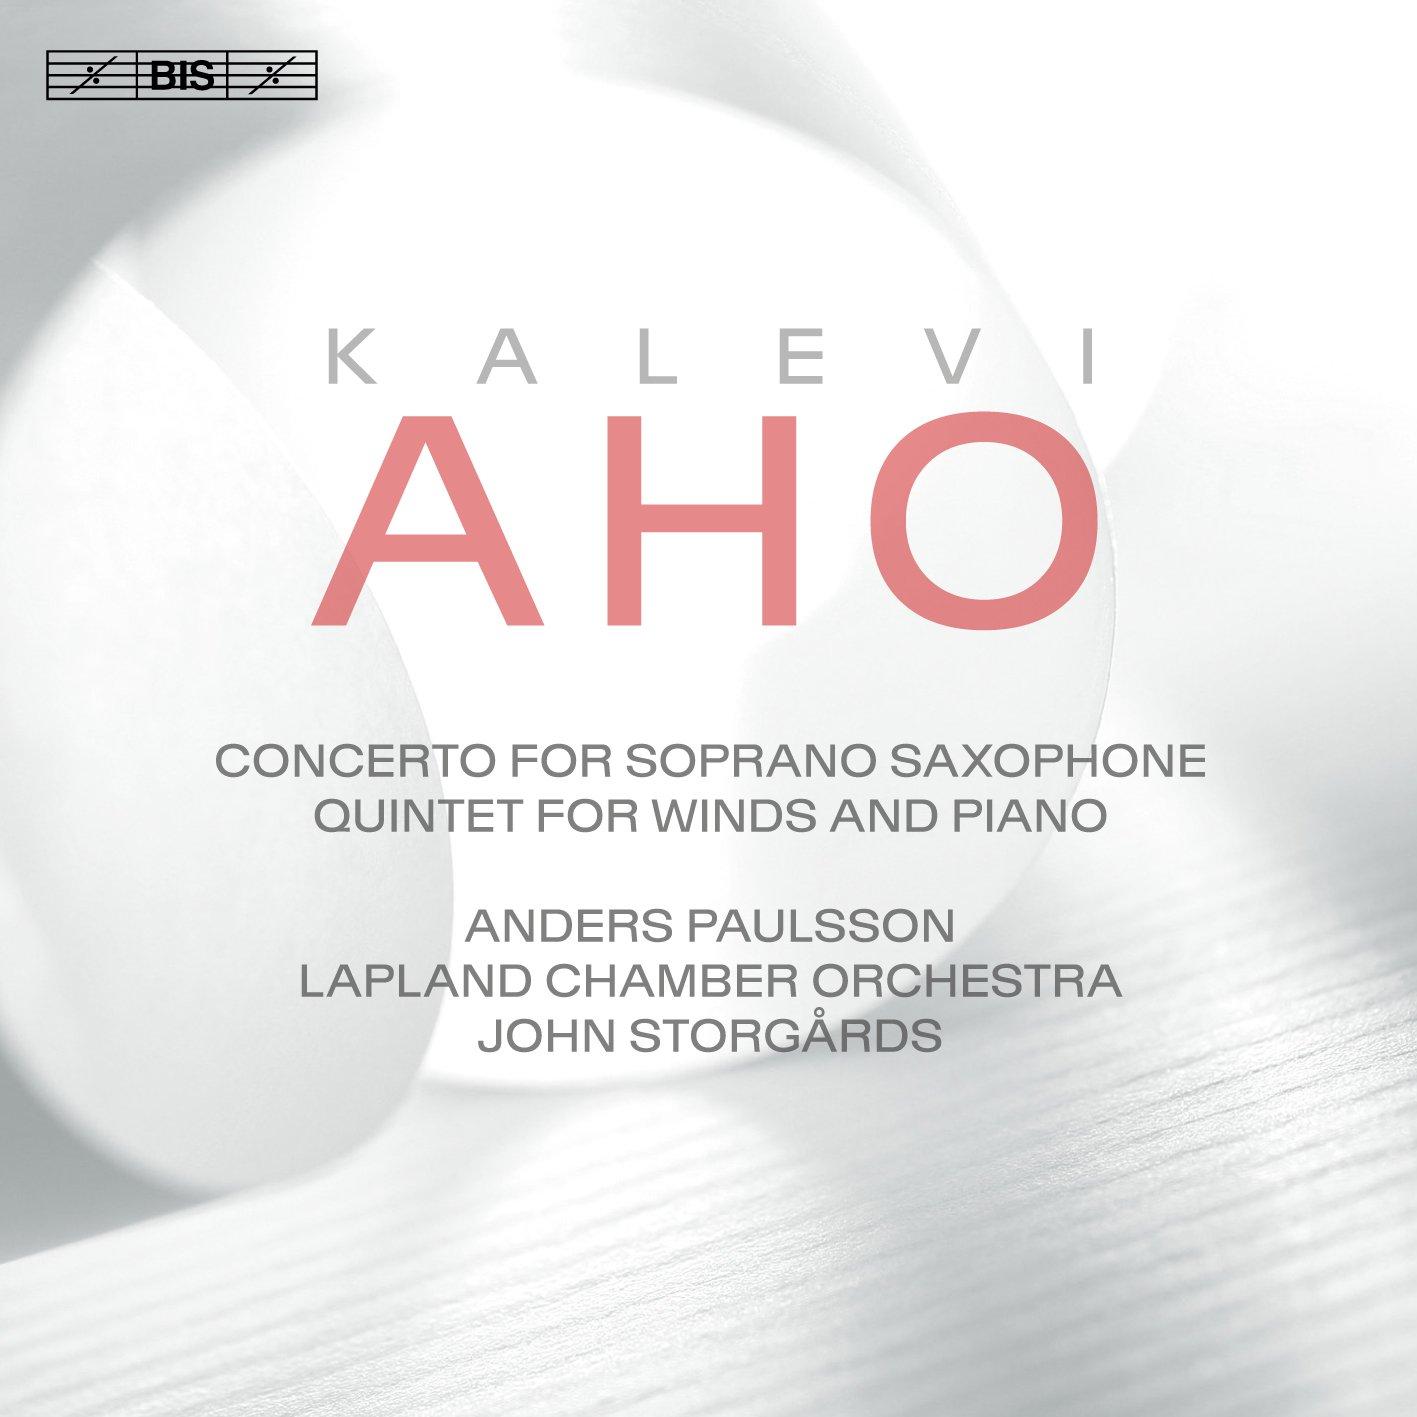 SACD : PAULSSON,ANDERS / LAPLAND CHAMBER ORCHESTRA / VAINO JALKANEN / MARKKU MOILANEN / PEKKA NISKA - Concerto For Soprano Saxophone & Chamber Orchestra (Hybrid SACD)